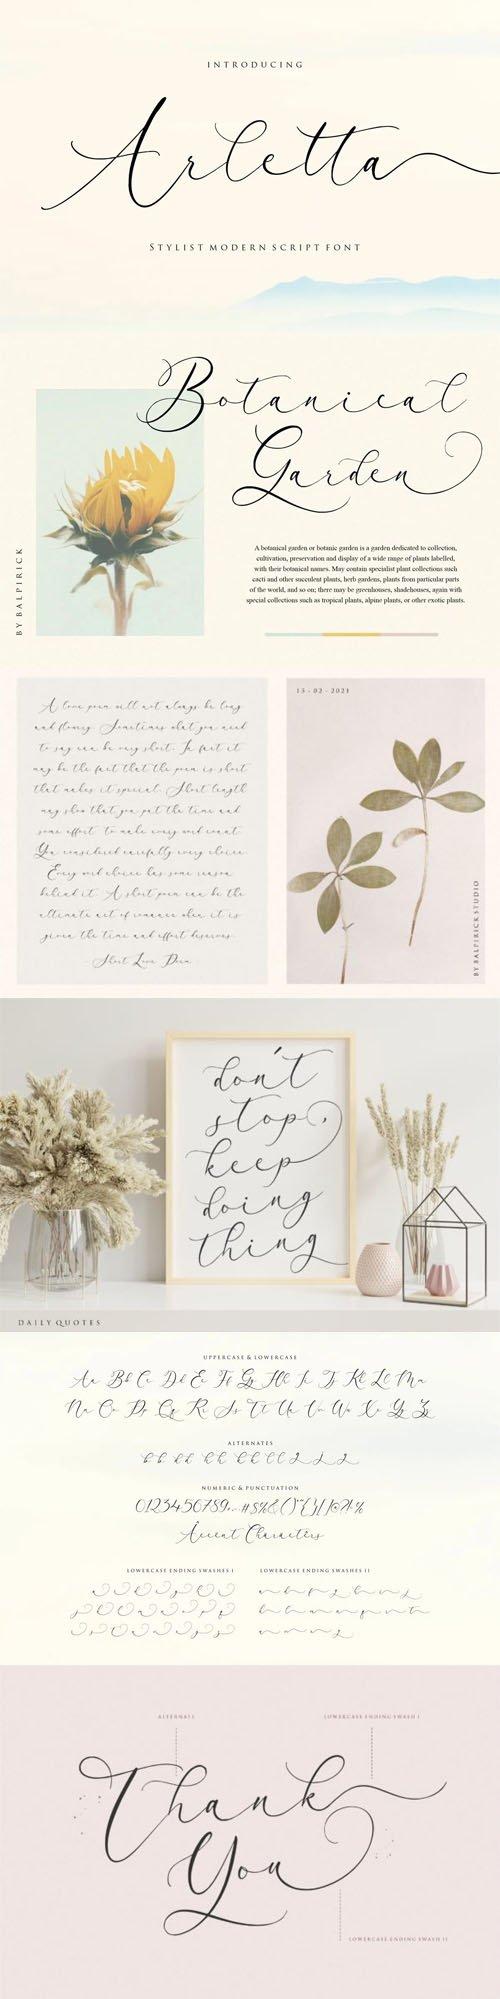 Arletta Calligraphy - Stylish Modern Script Font